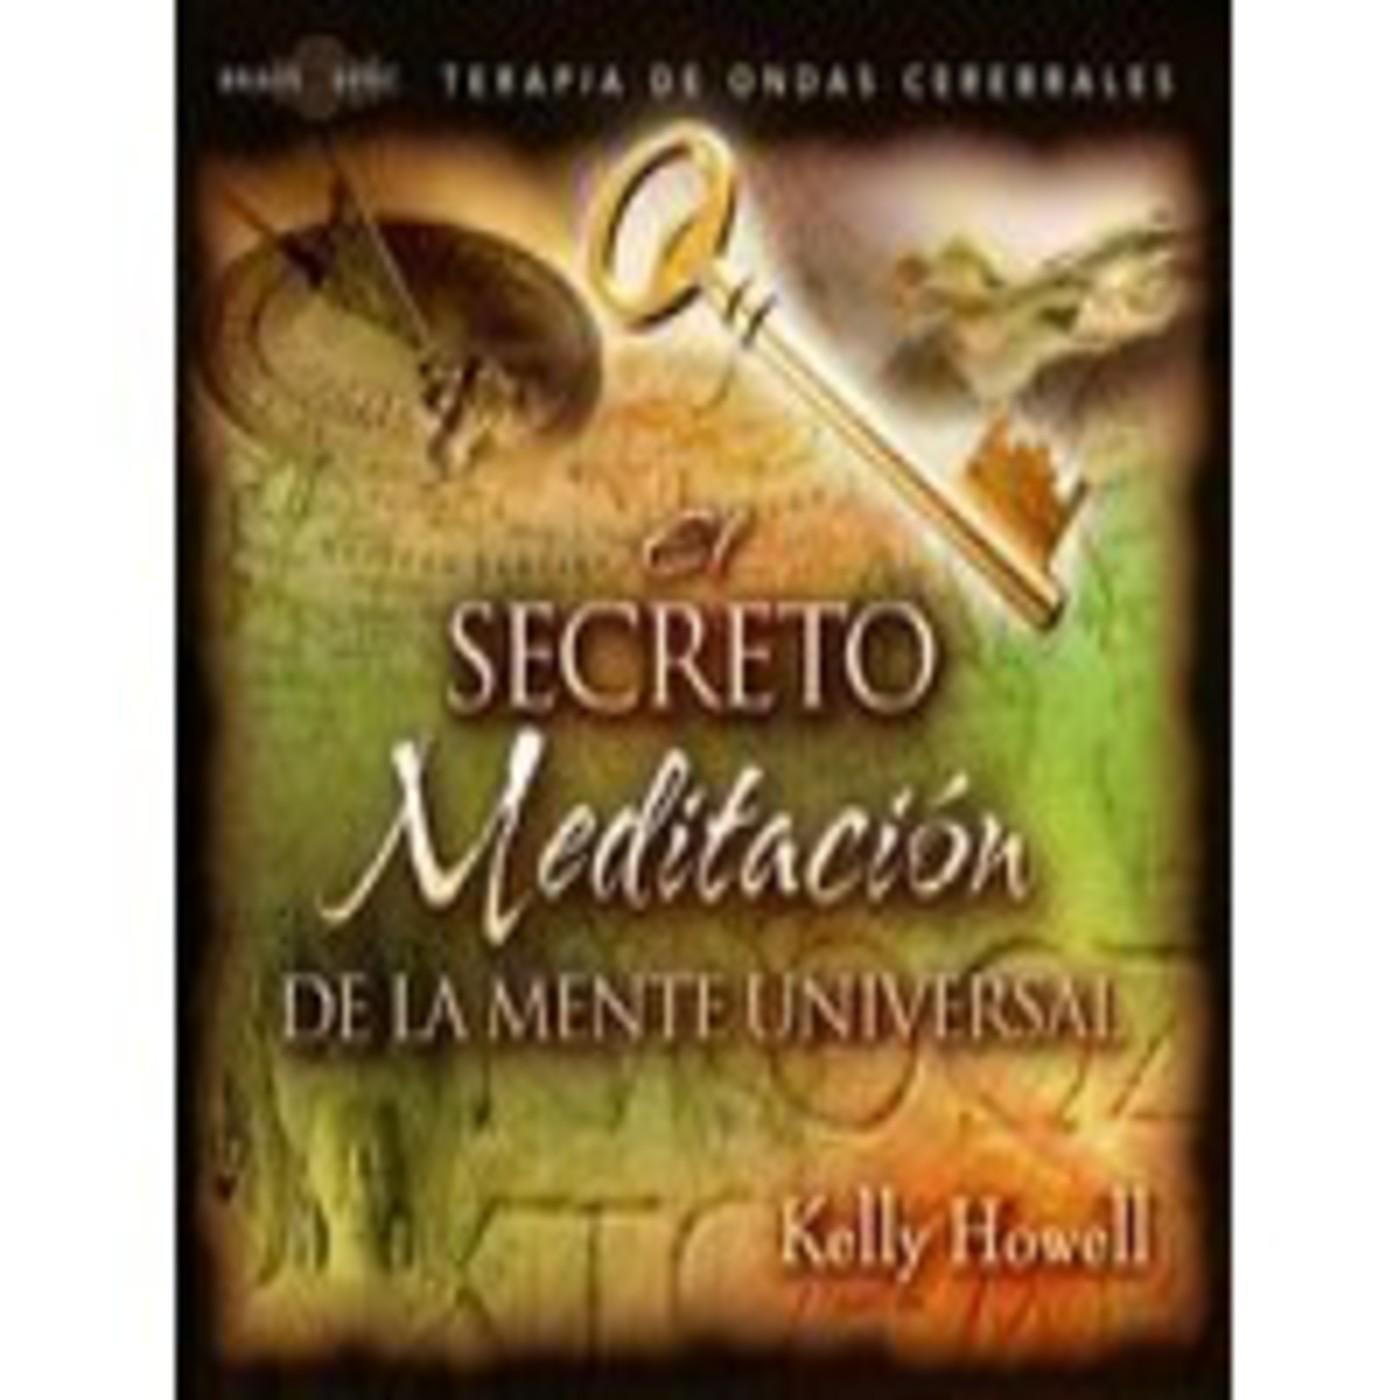 EL SECRETO, MEDITACION DE LA MENTE UNIVERSAL, Kelly Howell [ Audio CD ]